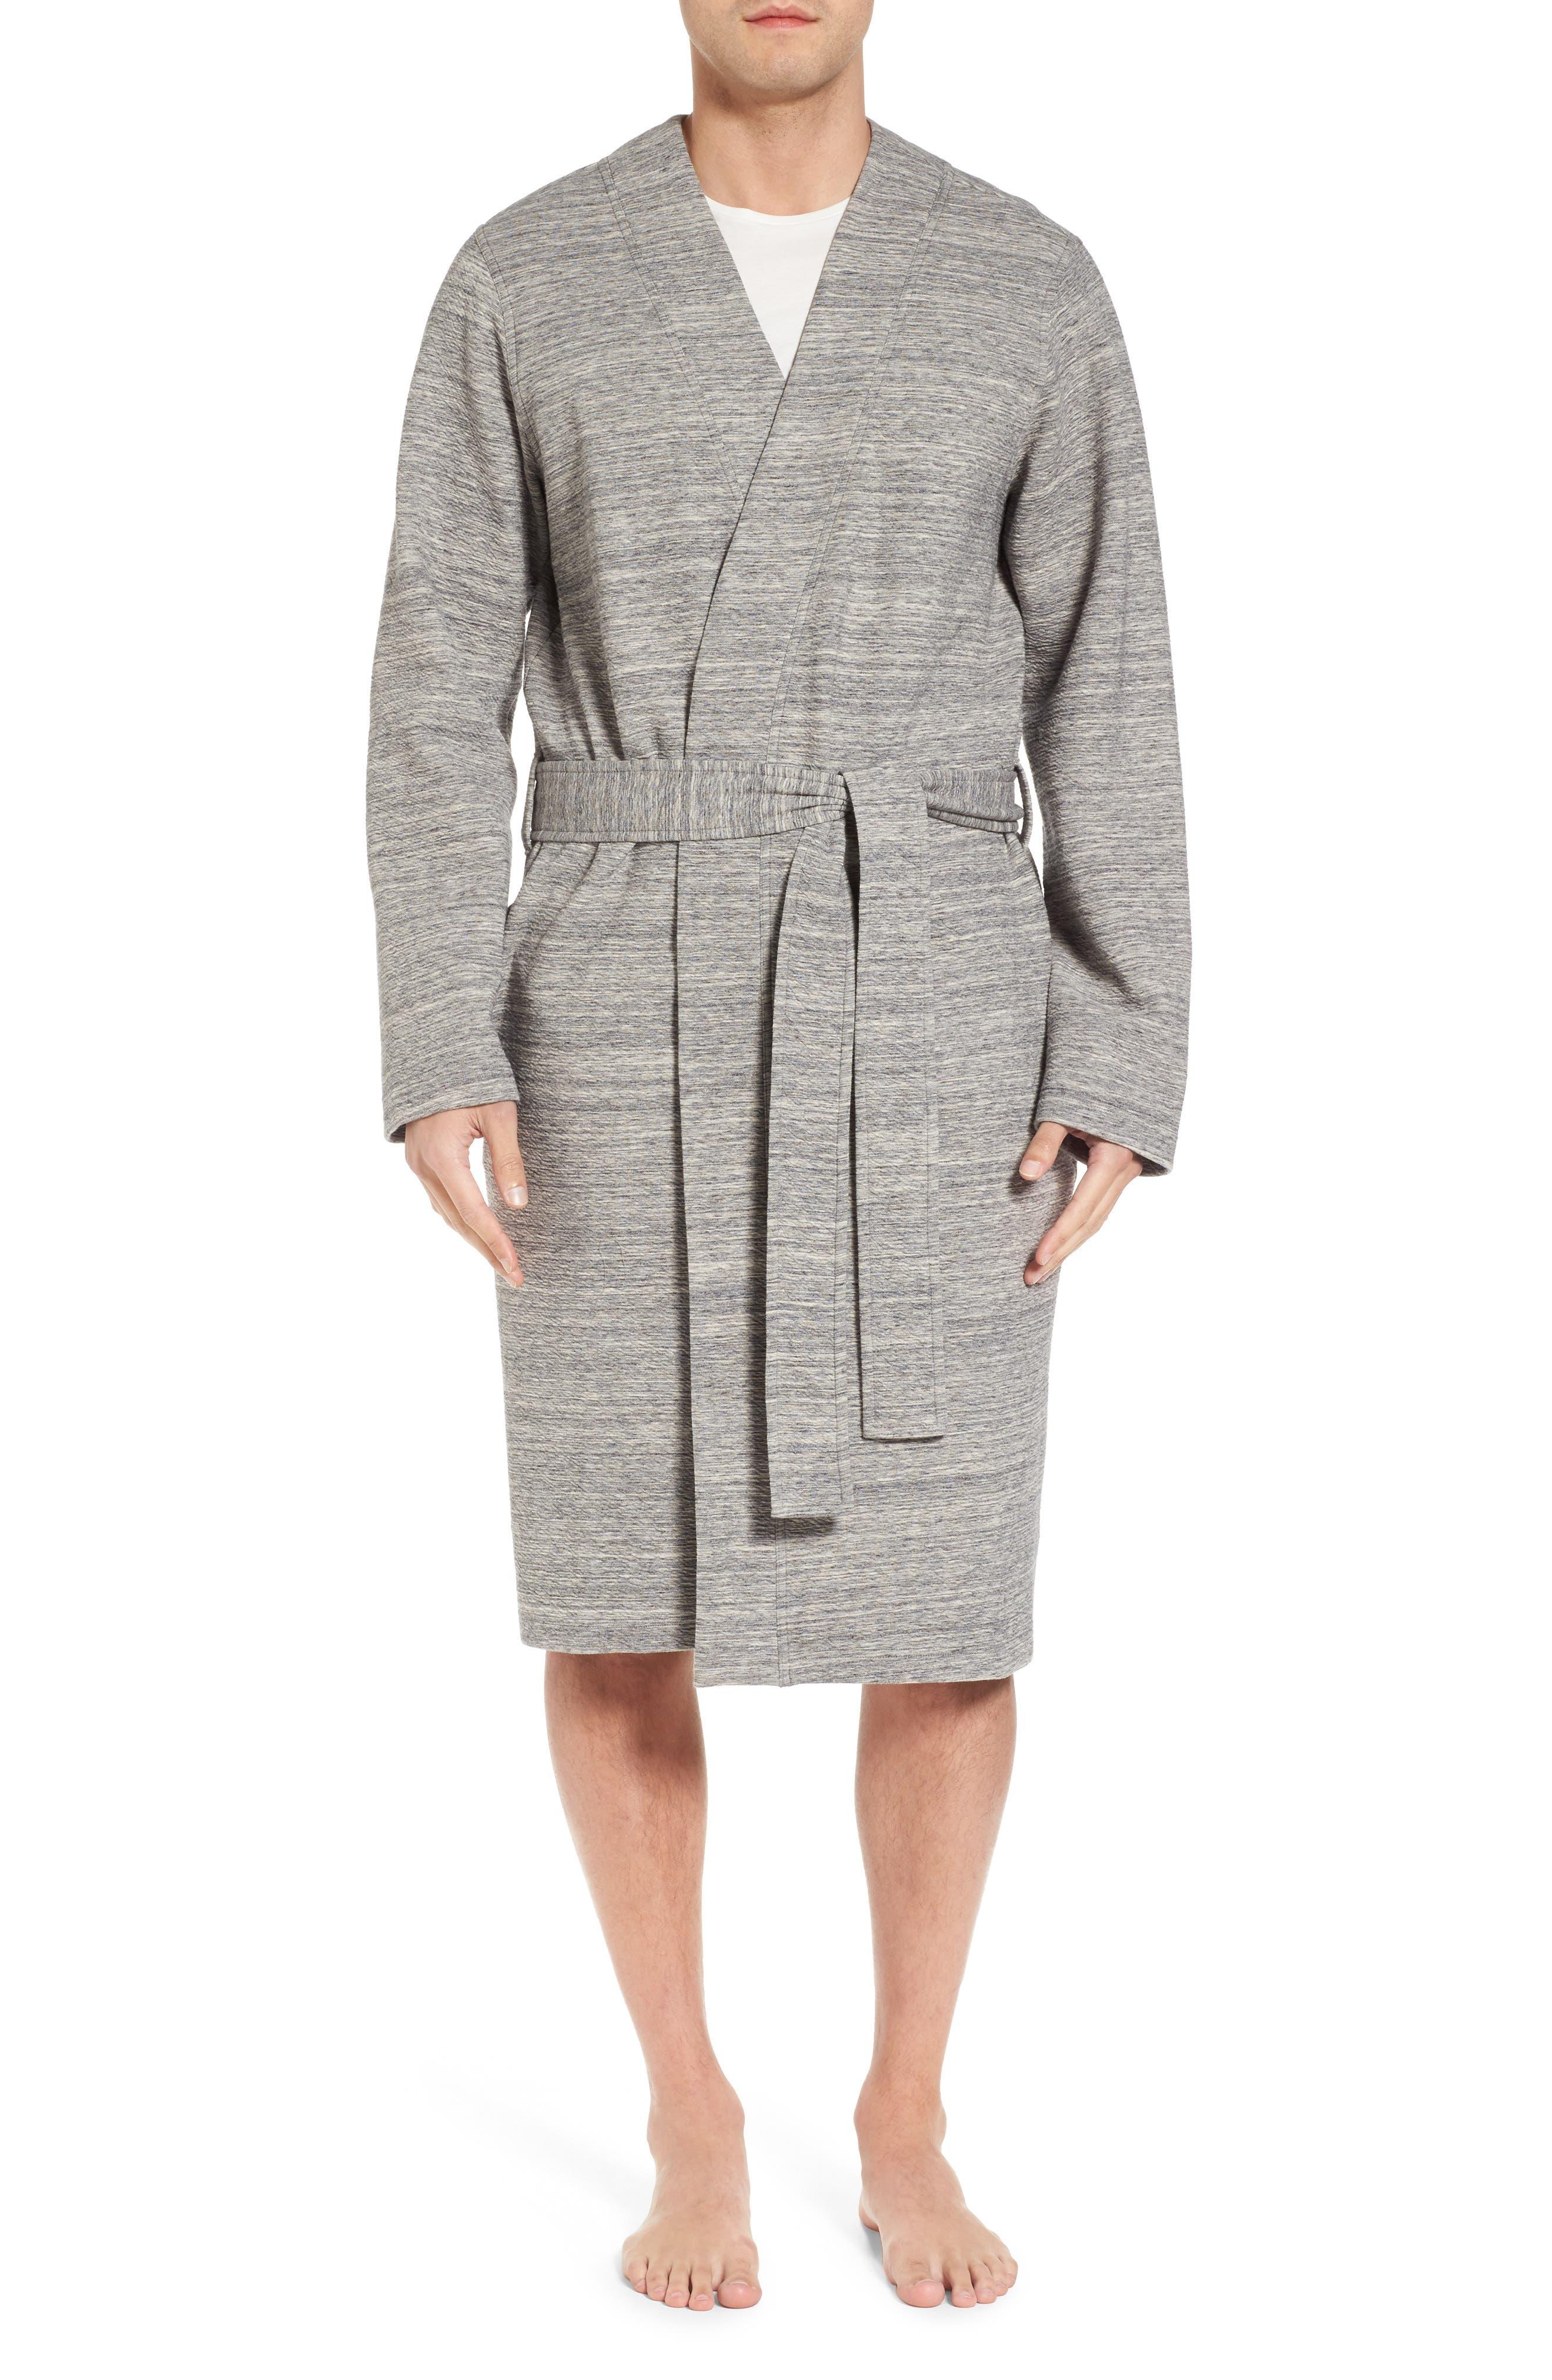 UGG® Kent Cotton Blend Robe